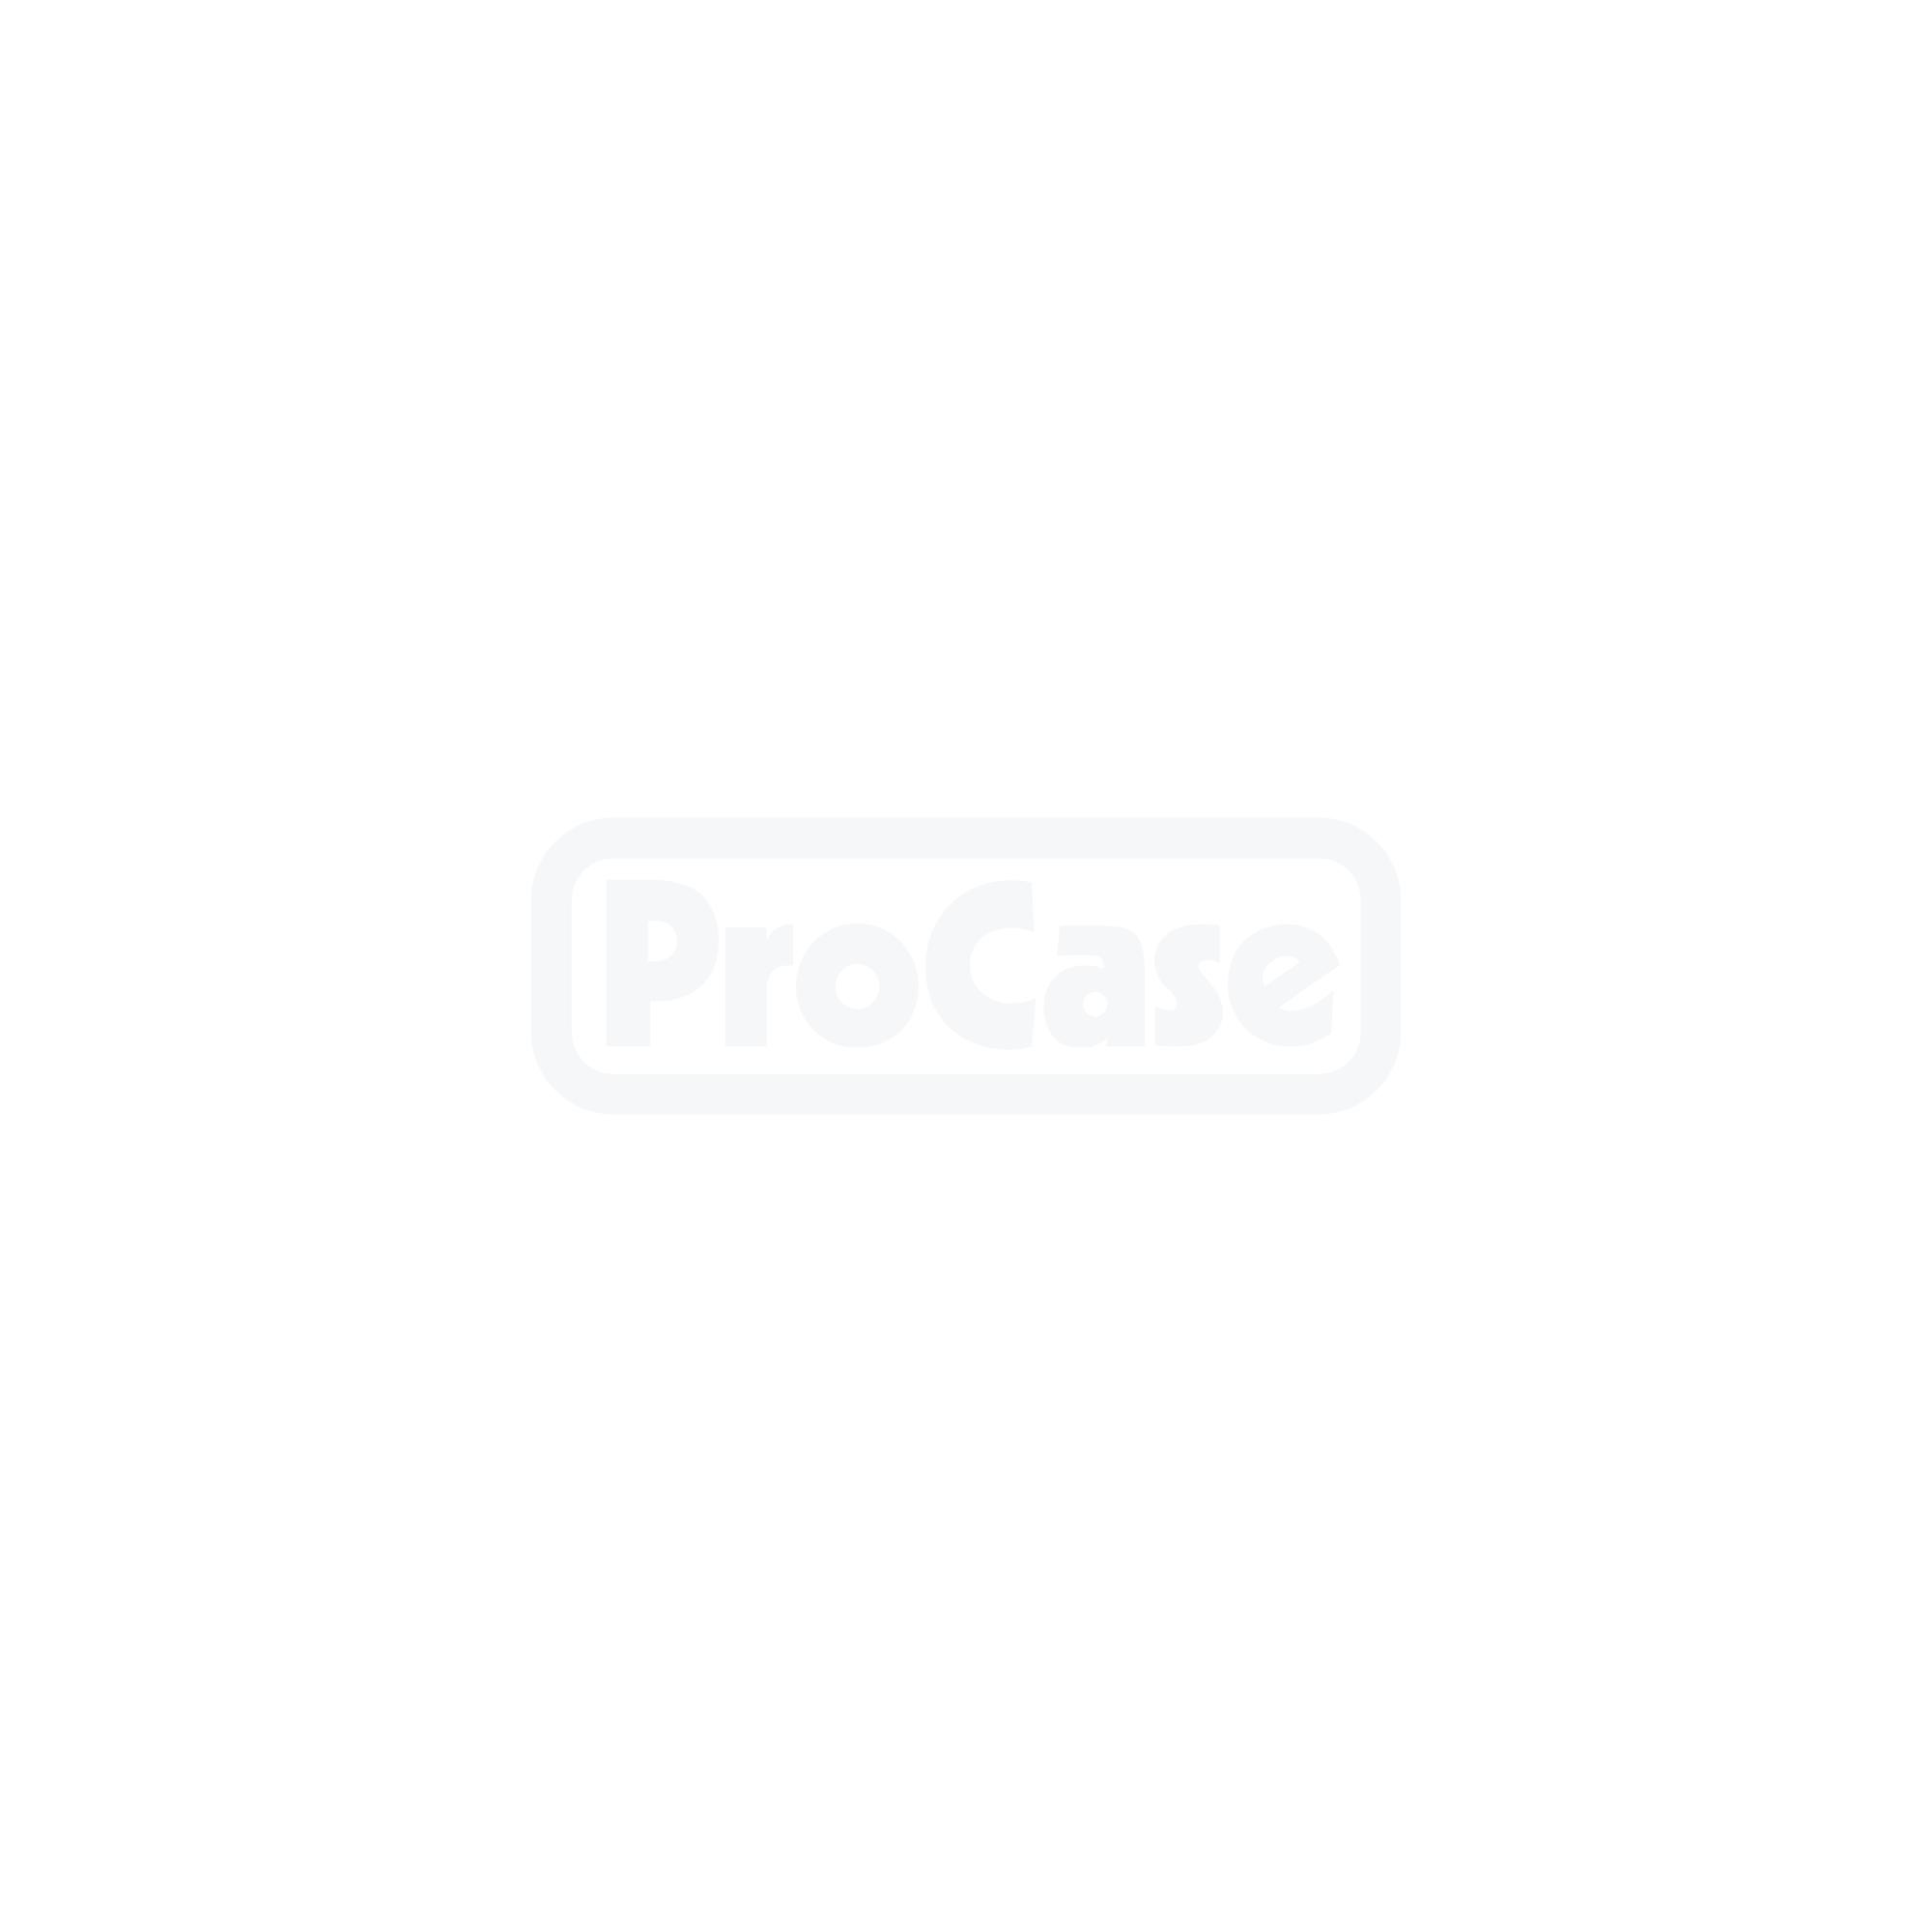 QSD-Doppelrack 2x 20HE 800 mm tief